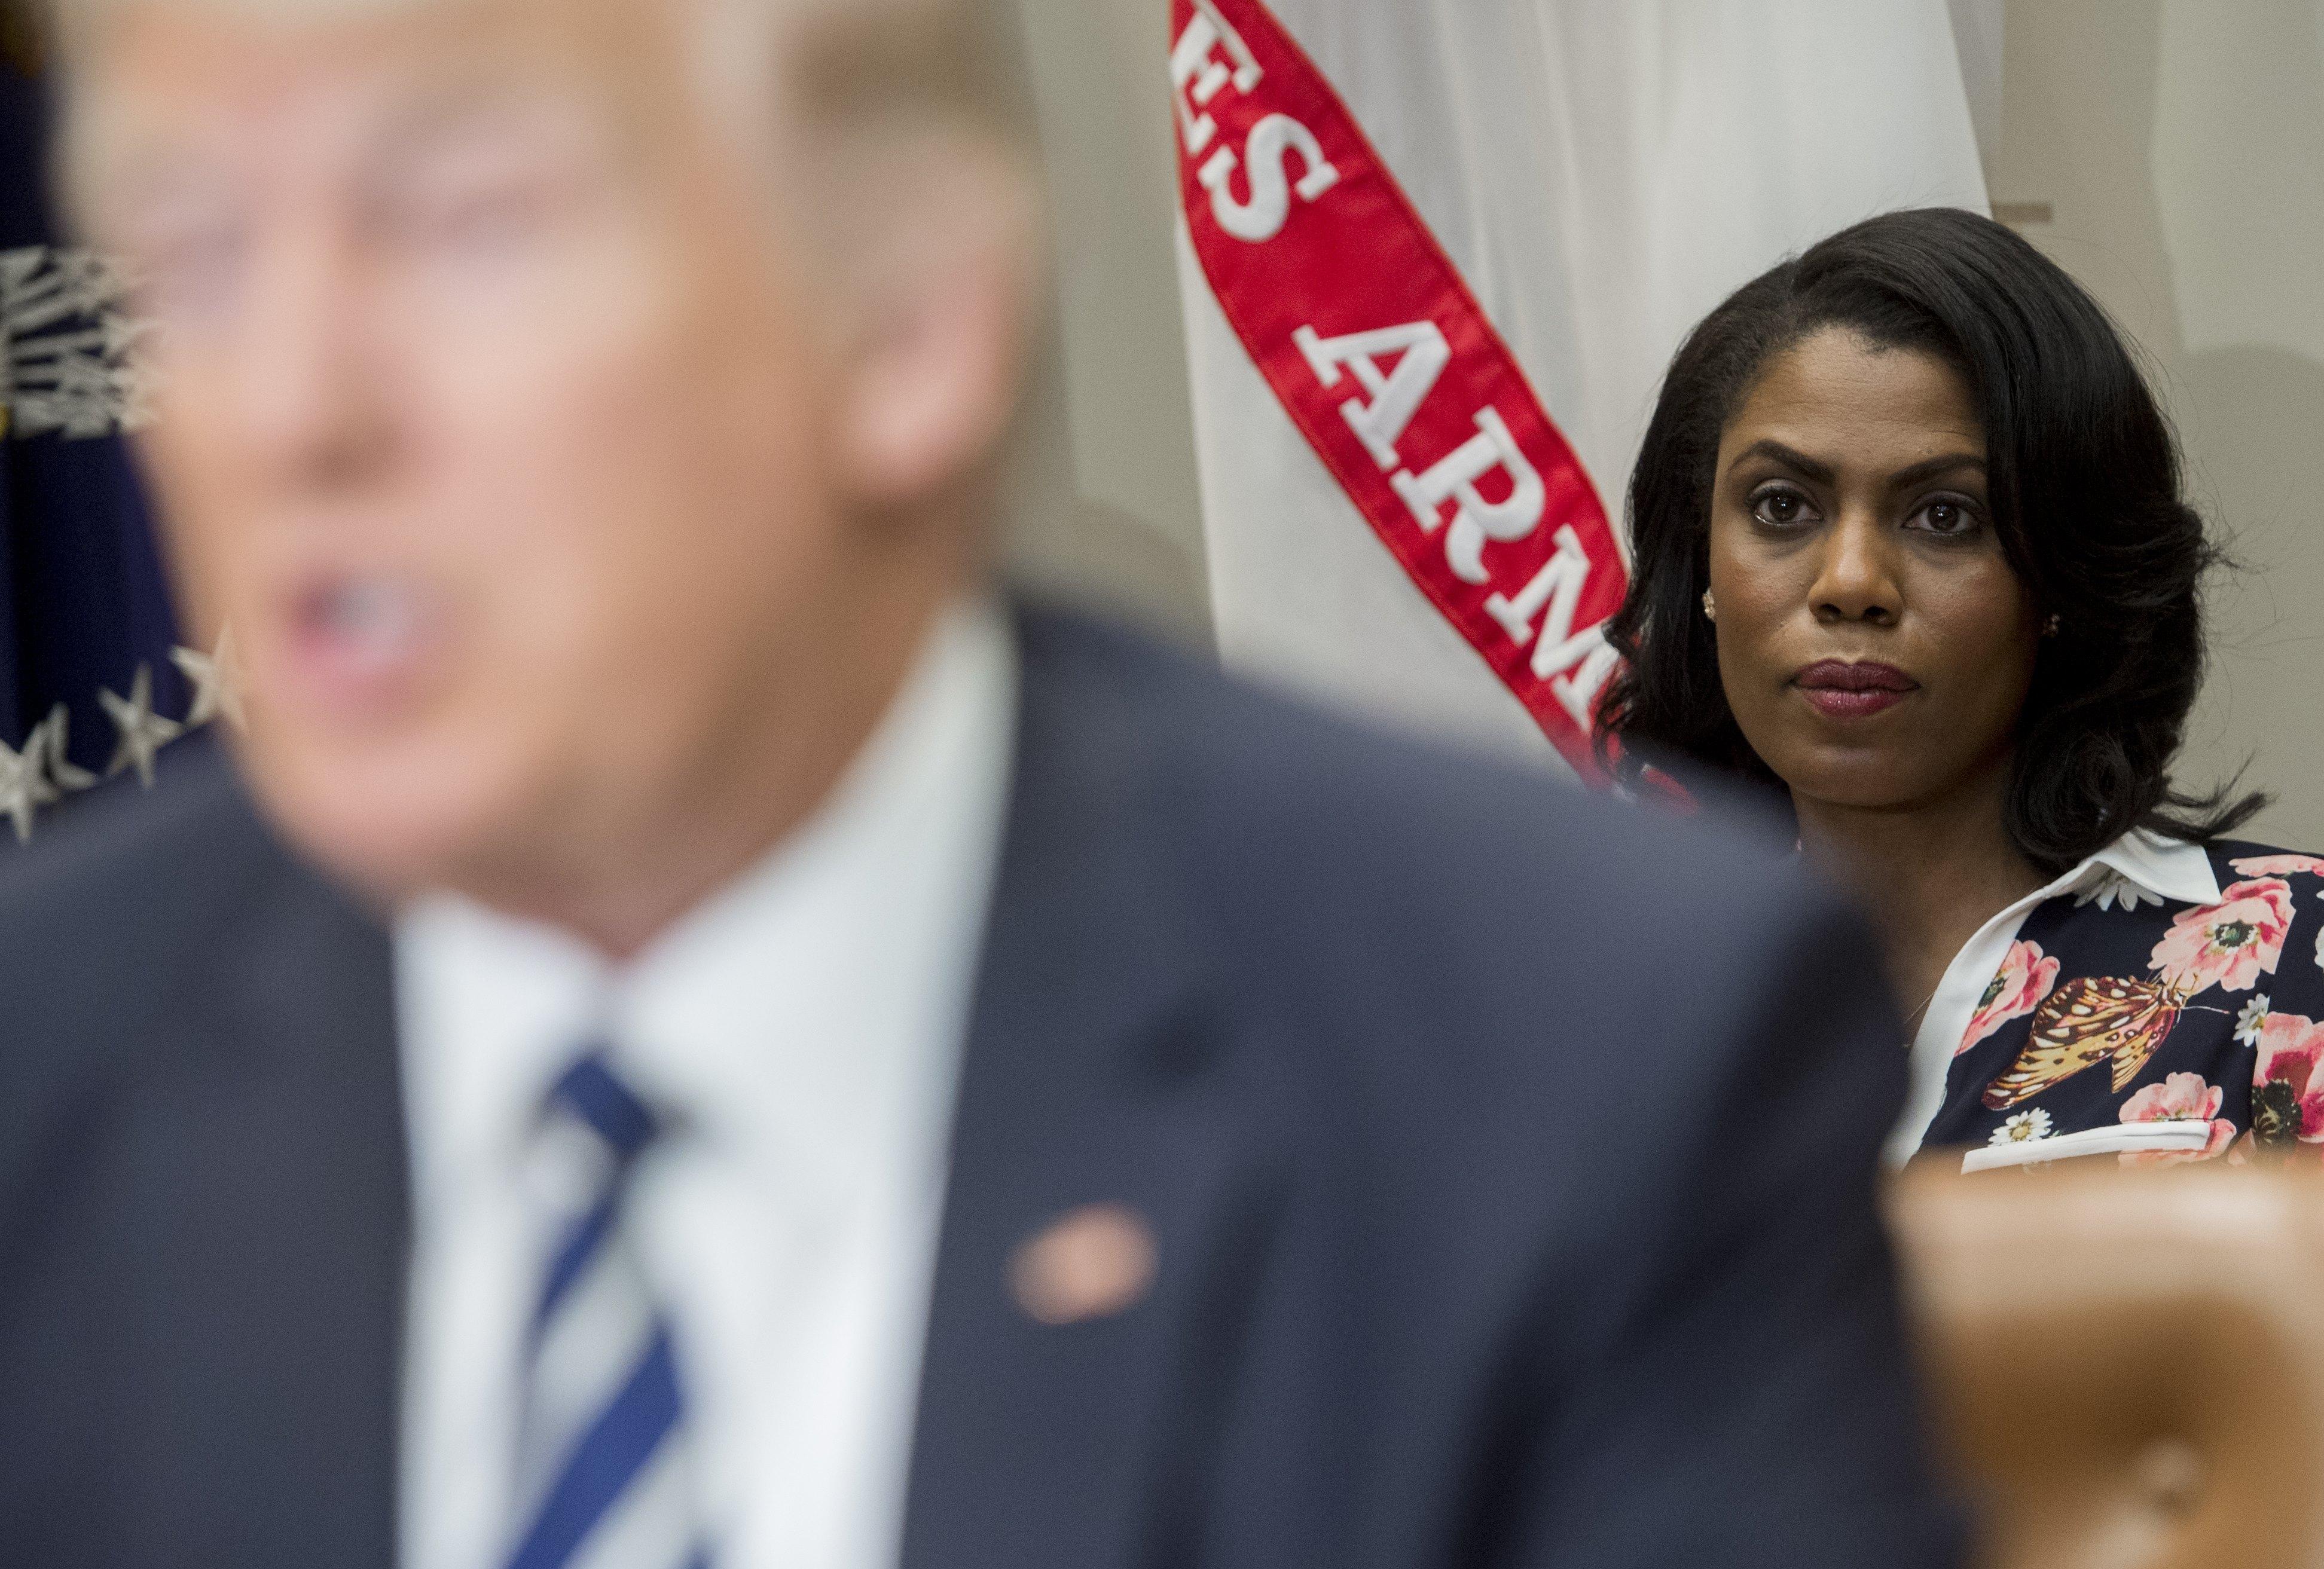 Omarosa Manigault Newman sits behind Donald Trump